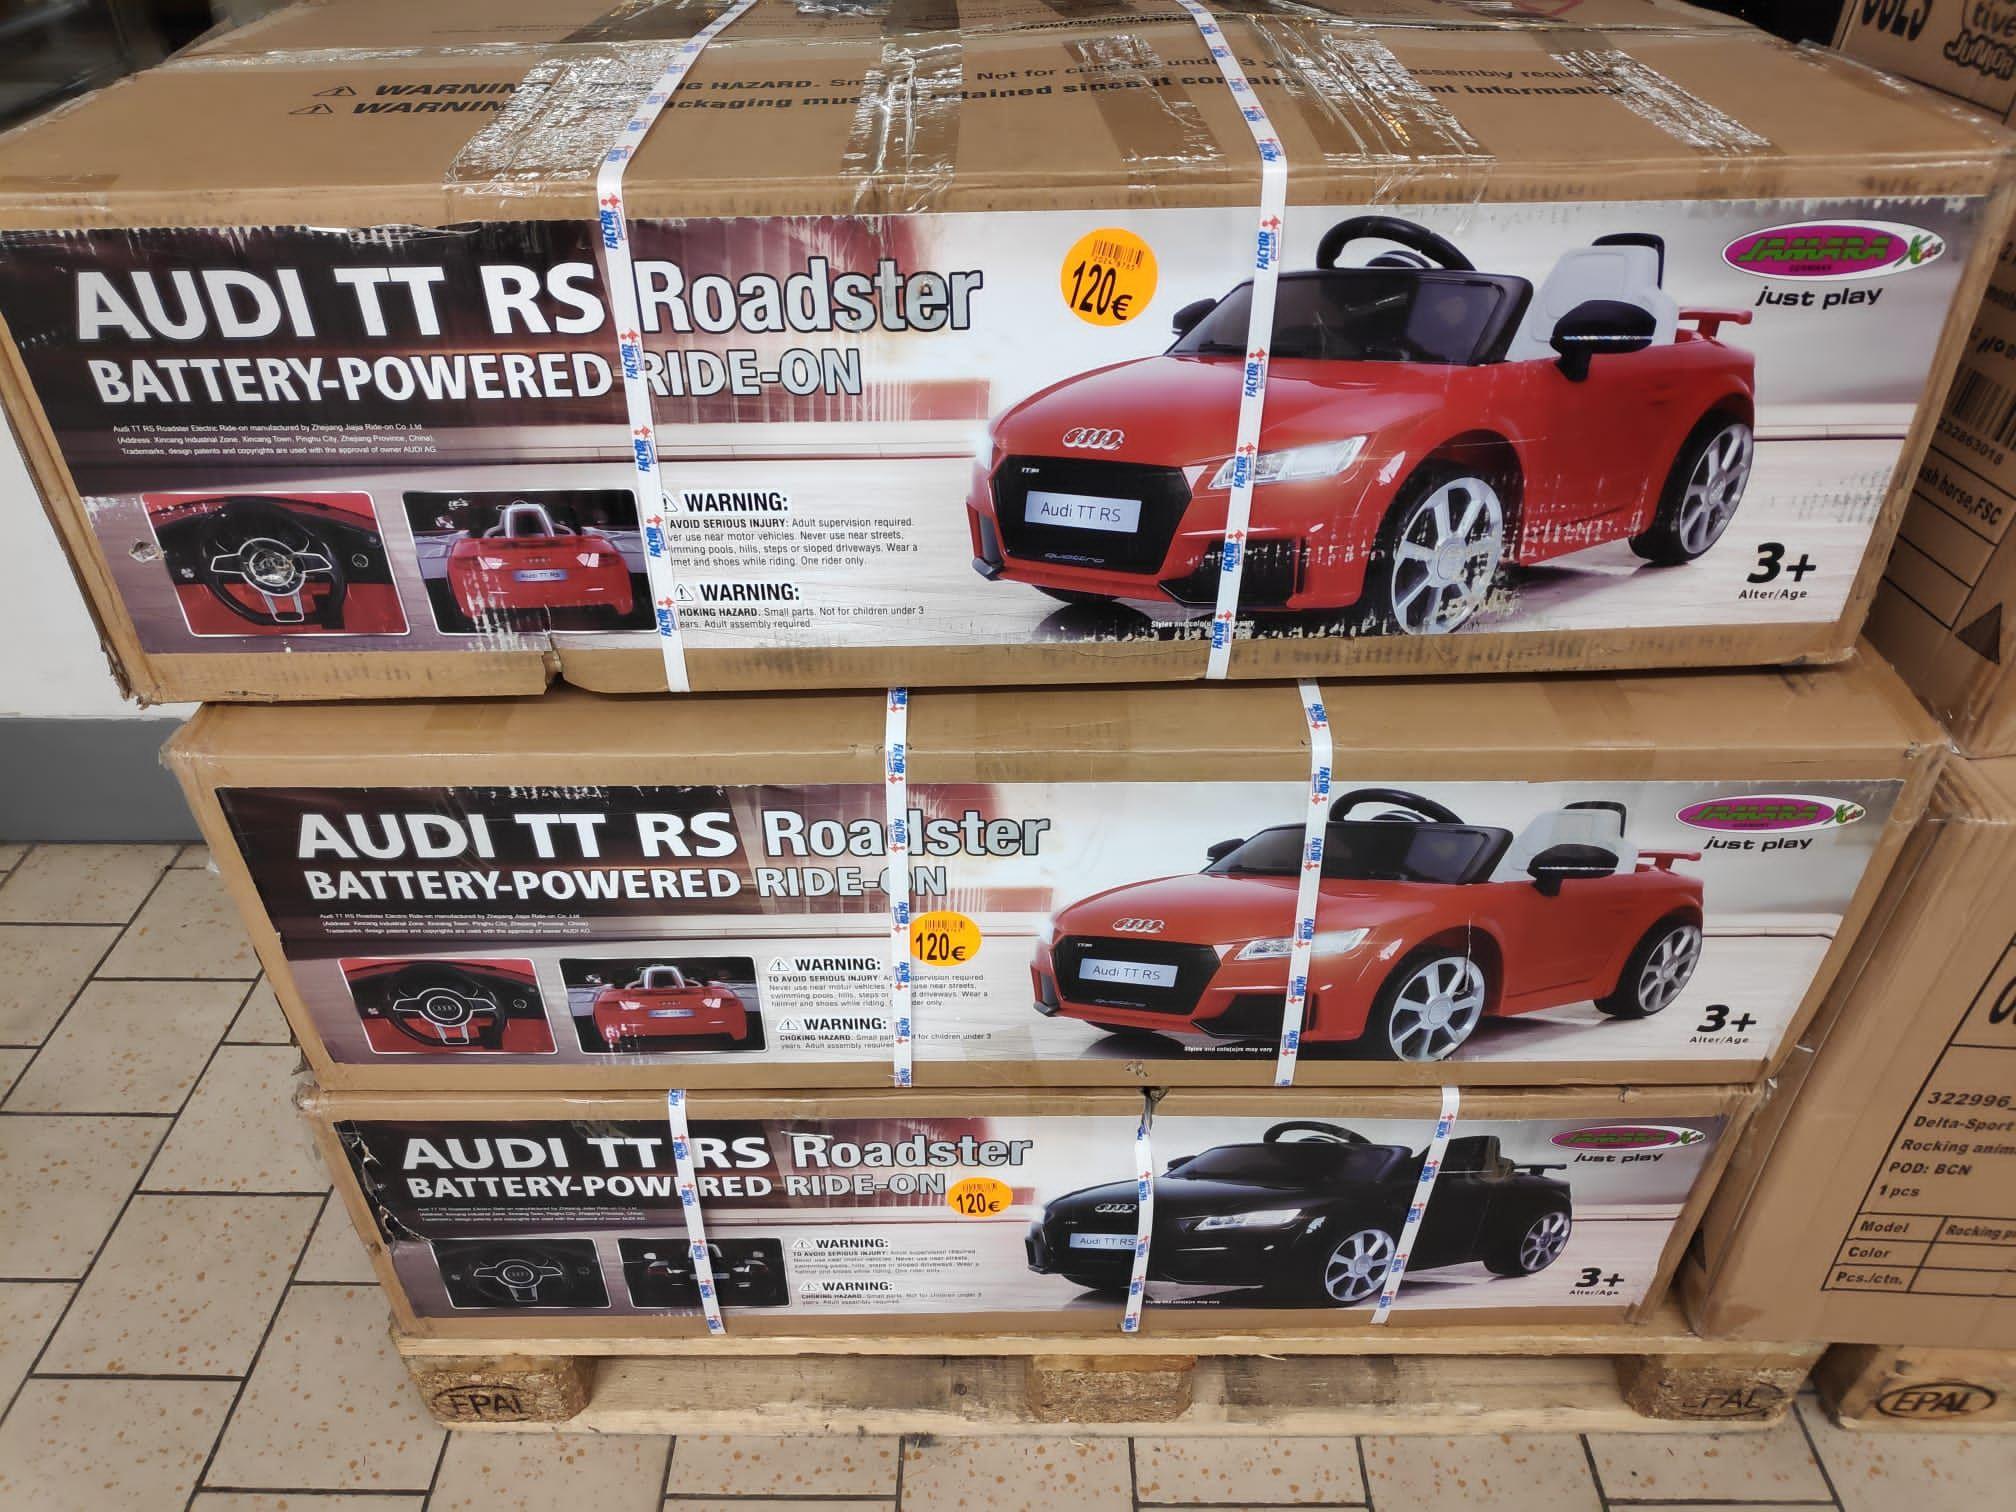 Audi TT RS roadster coche eléctrico para niños y futuros macois( Lidl outlet de Vallecas)